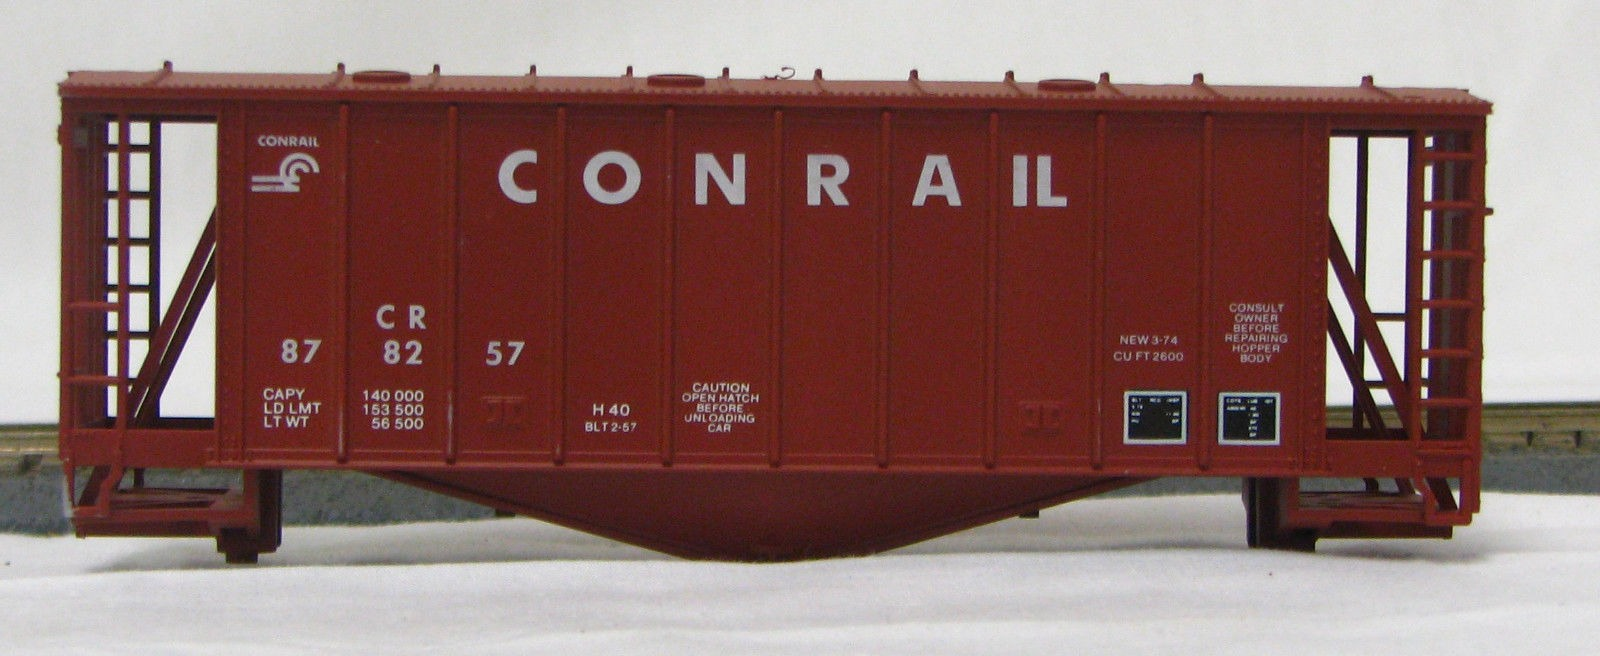 HO 2600 Cu Ft Airslide Covered Hopper (Kit) Conrail (1960's) (01-9715)